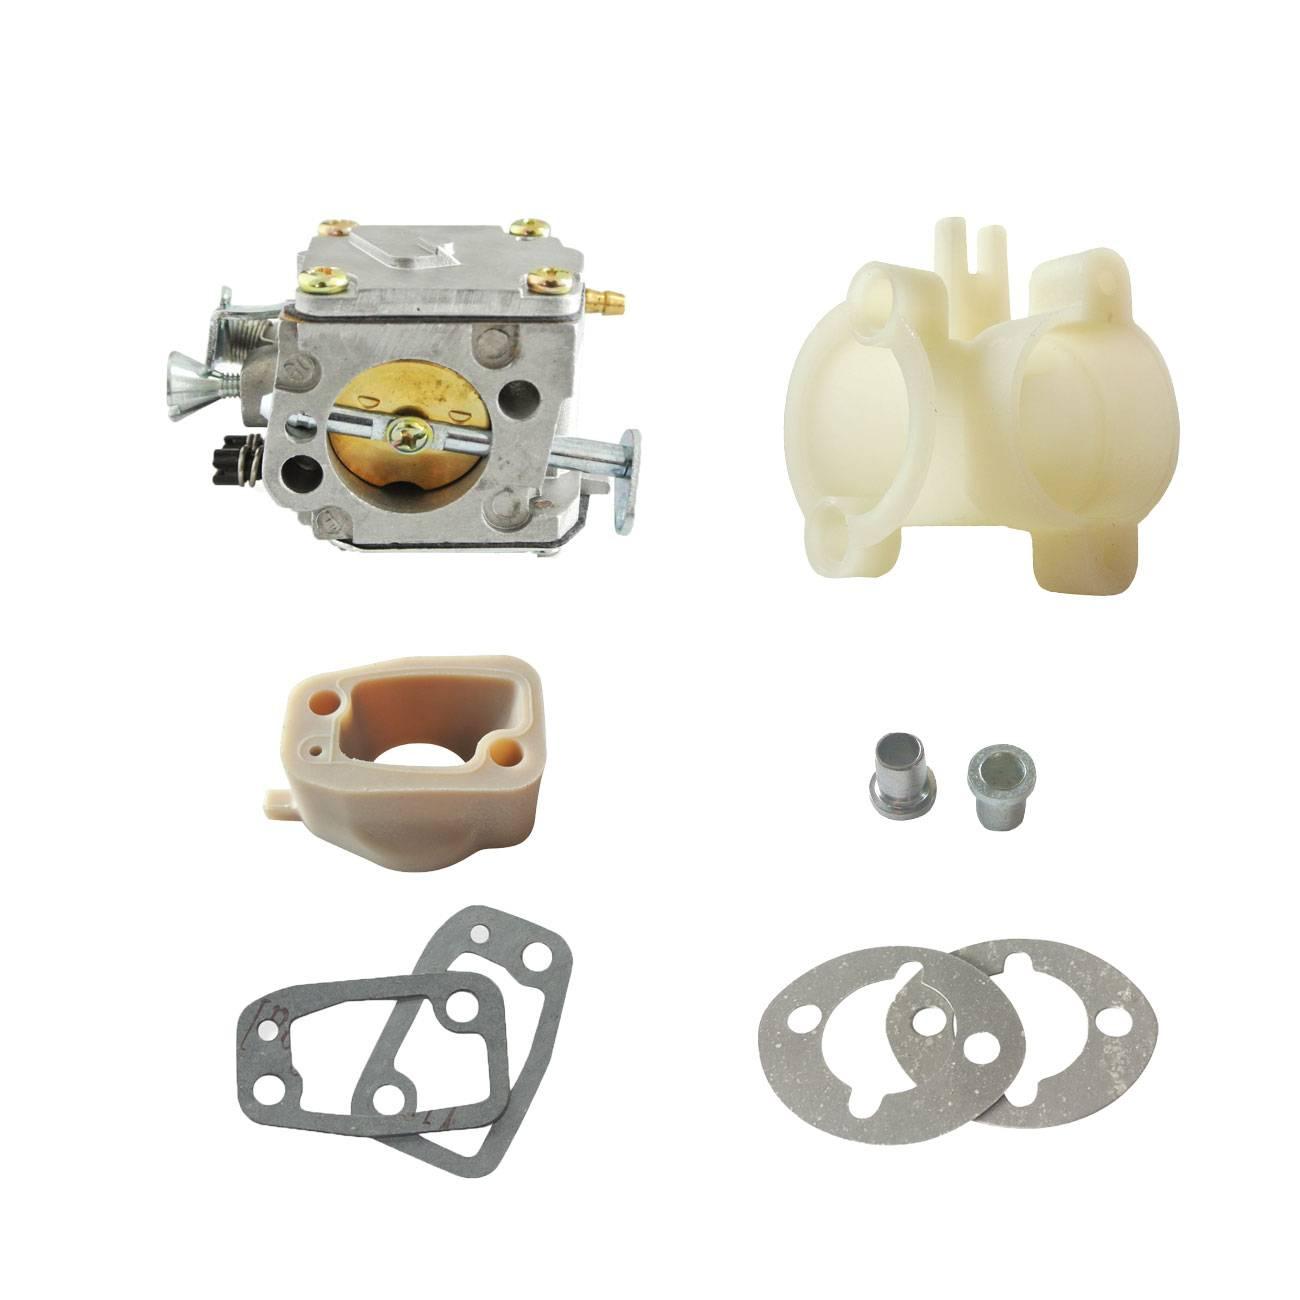 Carburetor and Intake Gaskets Fit HUSQVARNA 61 266 268 272 Chainsaw 20mmCarburetor and Intake Gaskets Fit HUSQVARNA 61 266 268 272 Chainsaw 20mm